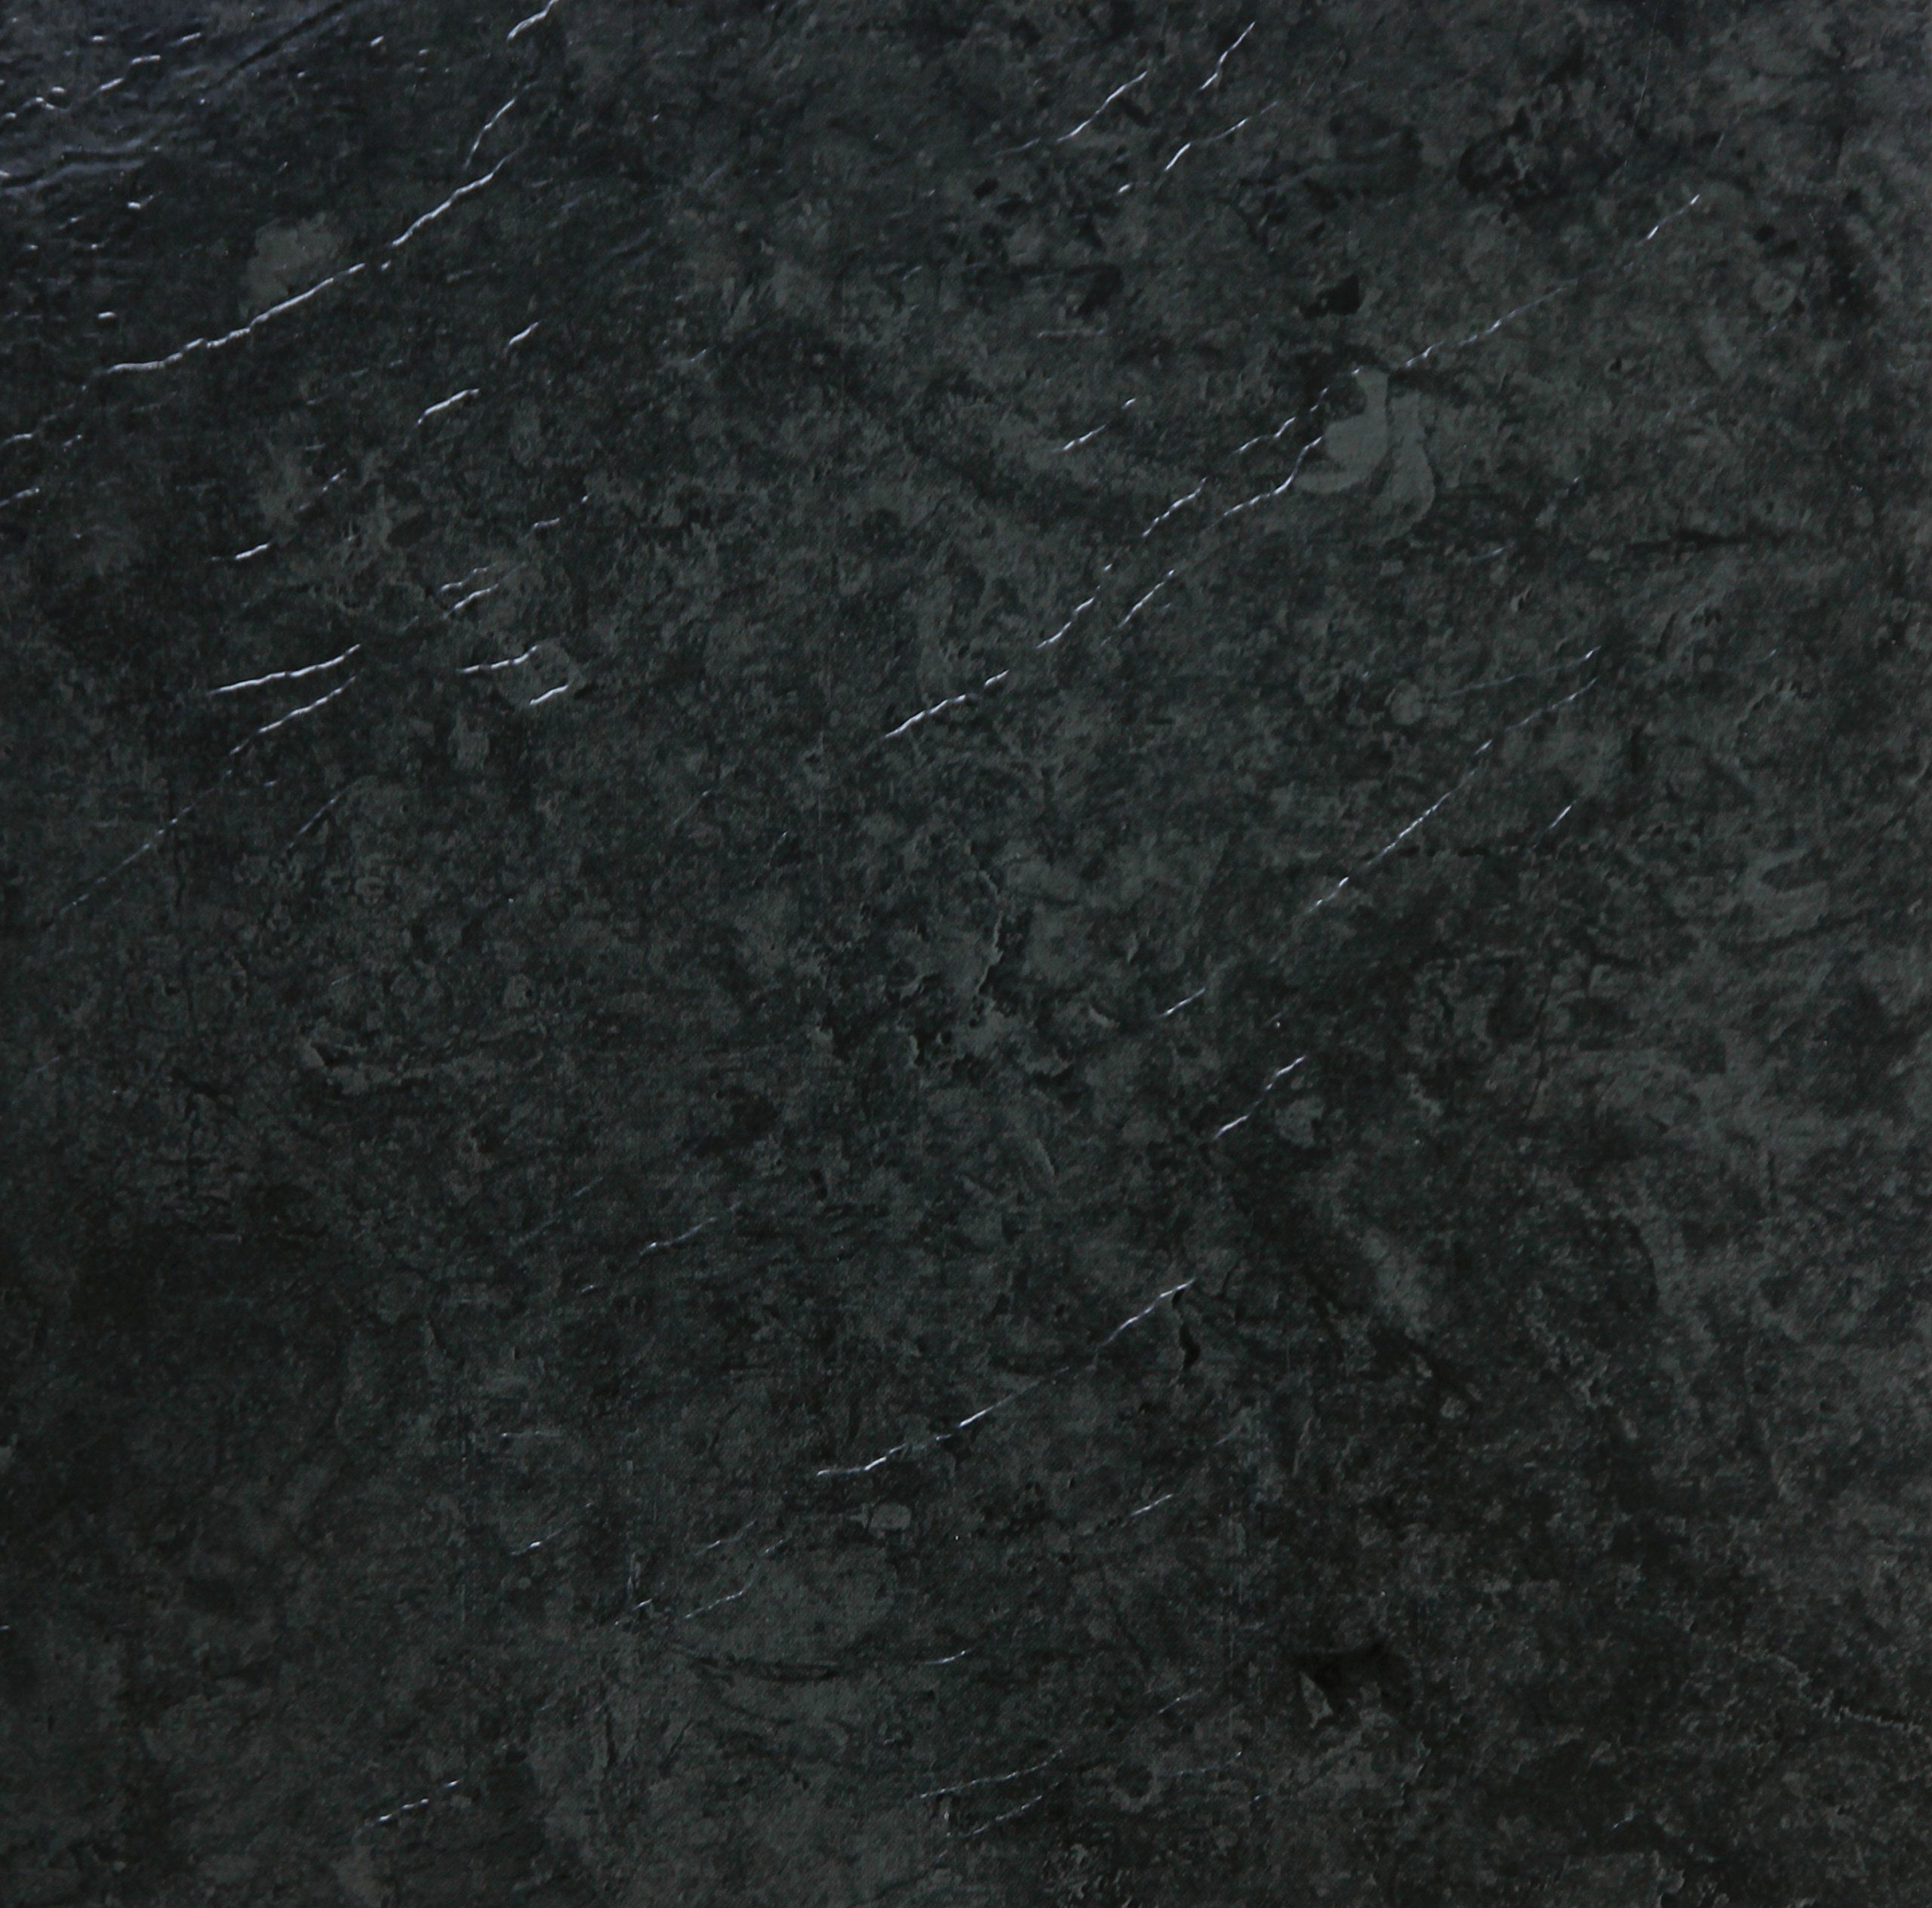 D c fix high quality self adhesive vinyl floor tiles slate grey d c fix high quality self adhesive vinyl floor tiles slate grey 1m per dailygadgetfo Images